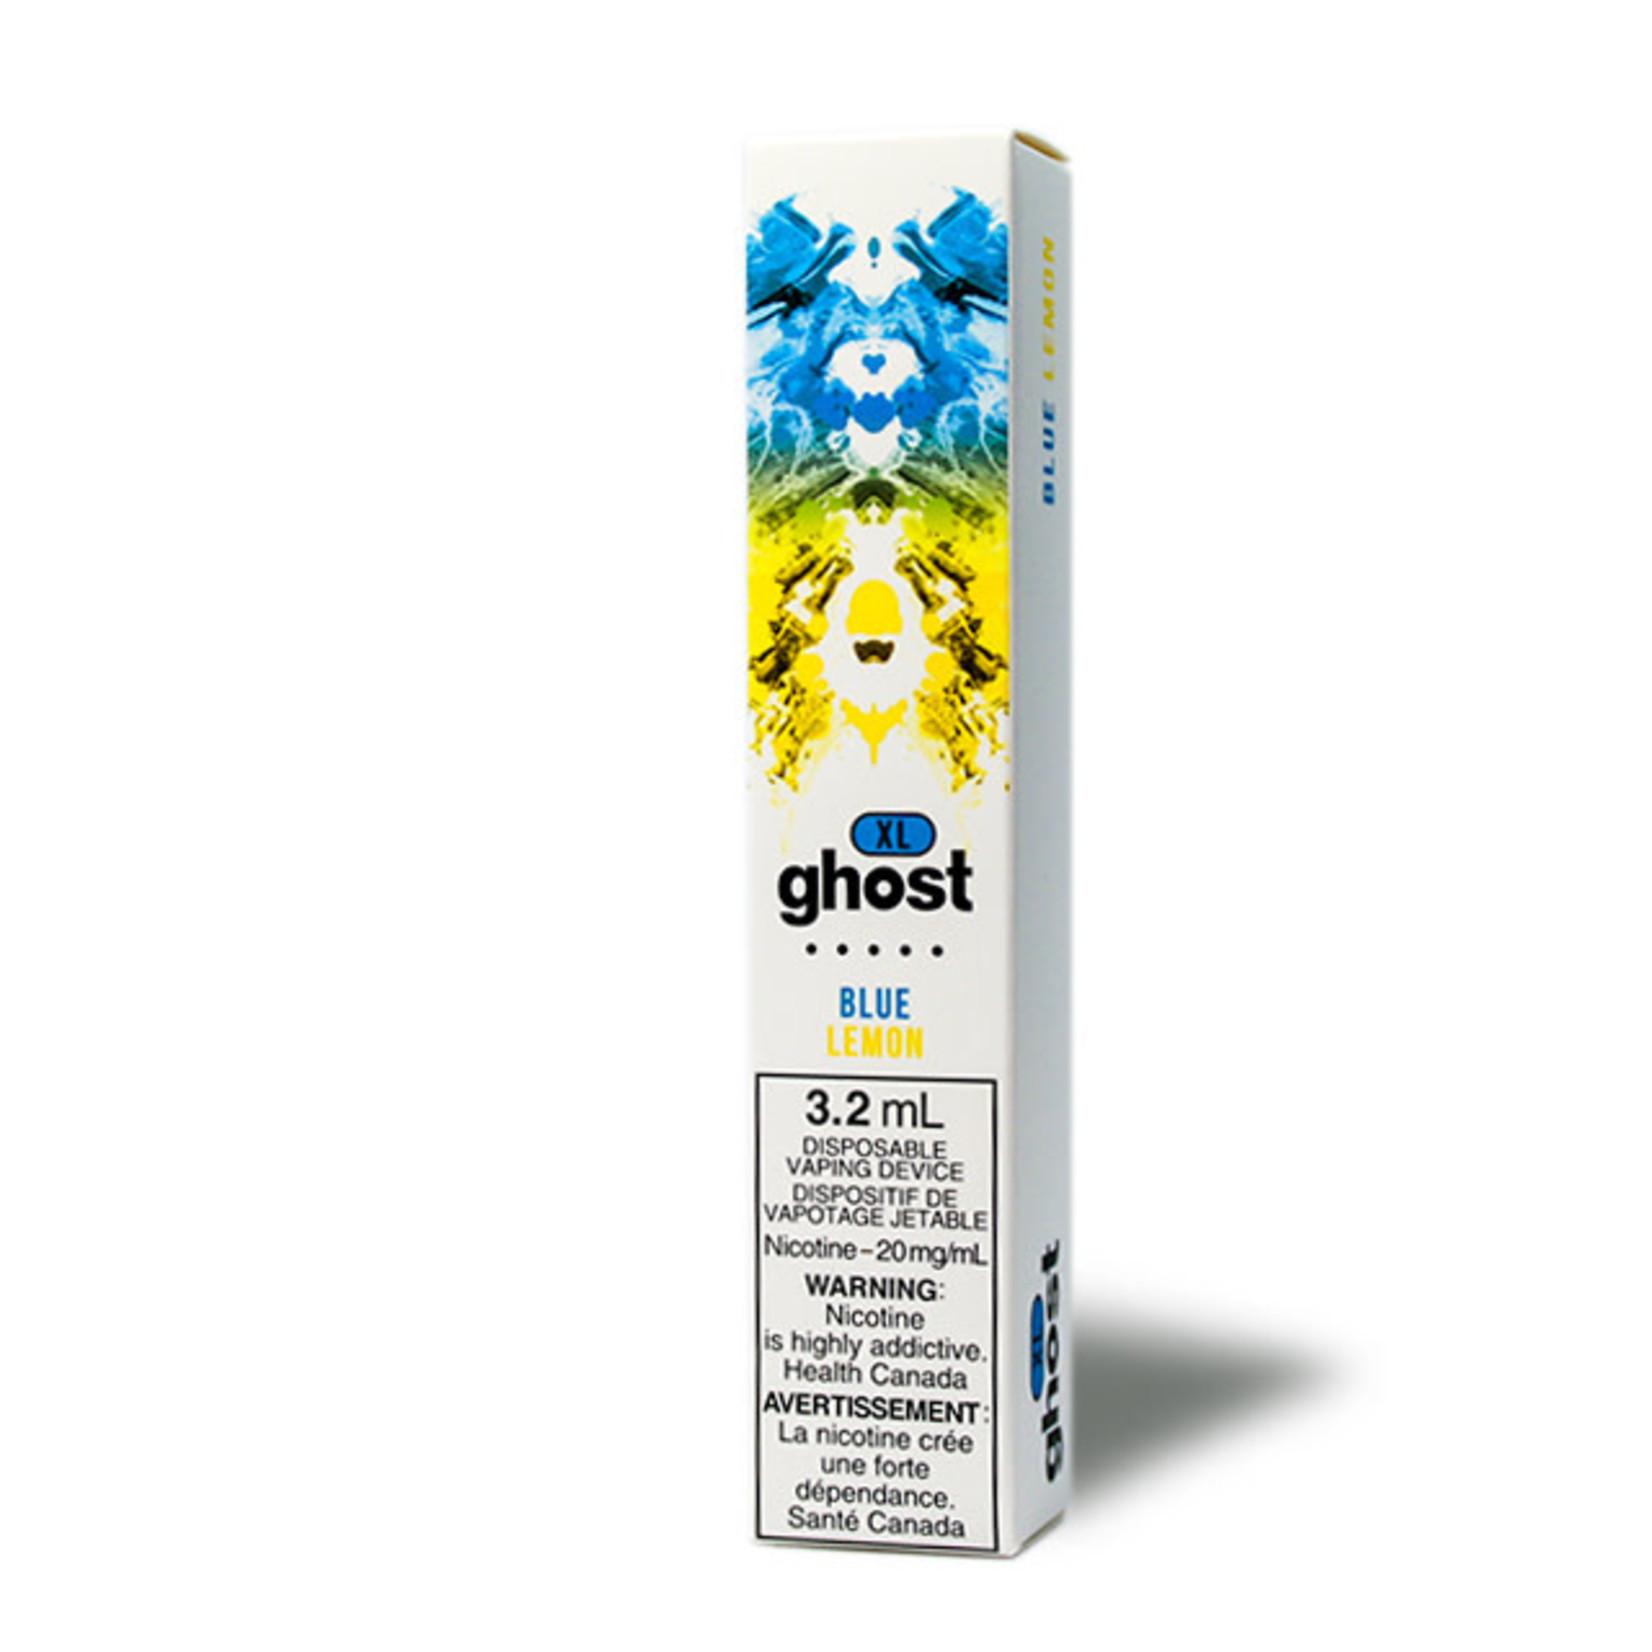 GHOST XL 800 PUFF Disposable Blue Lemon